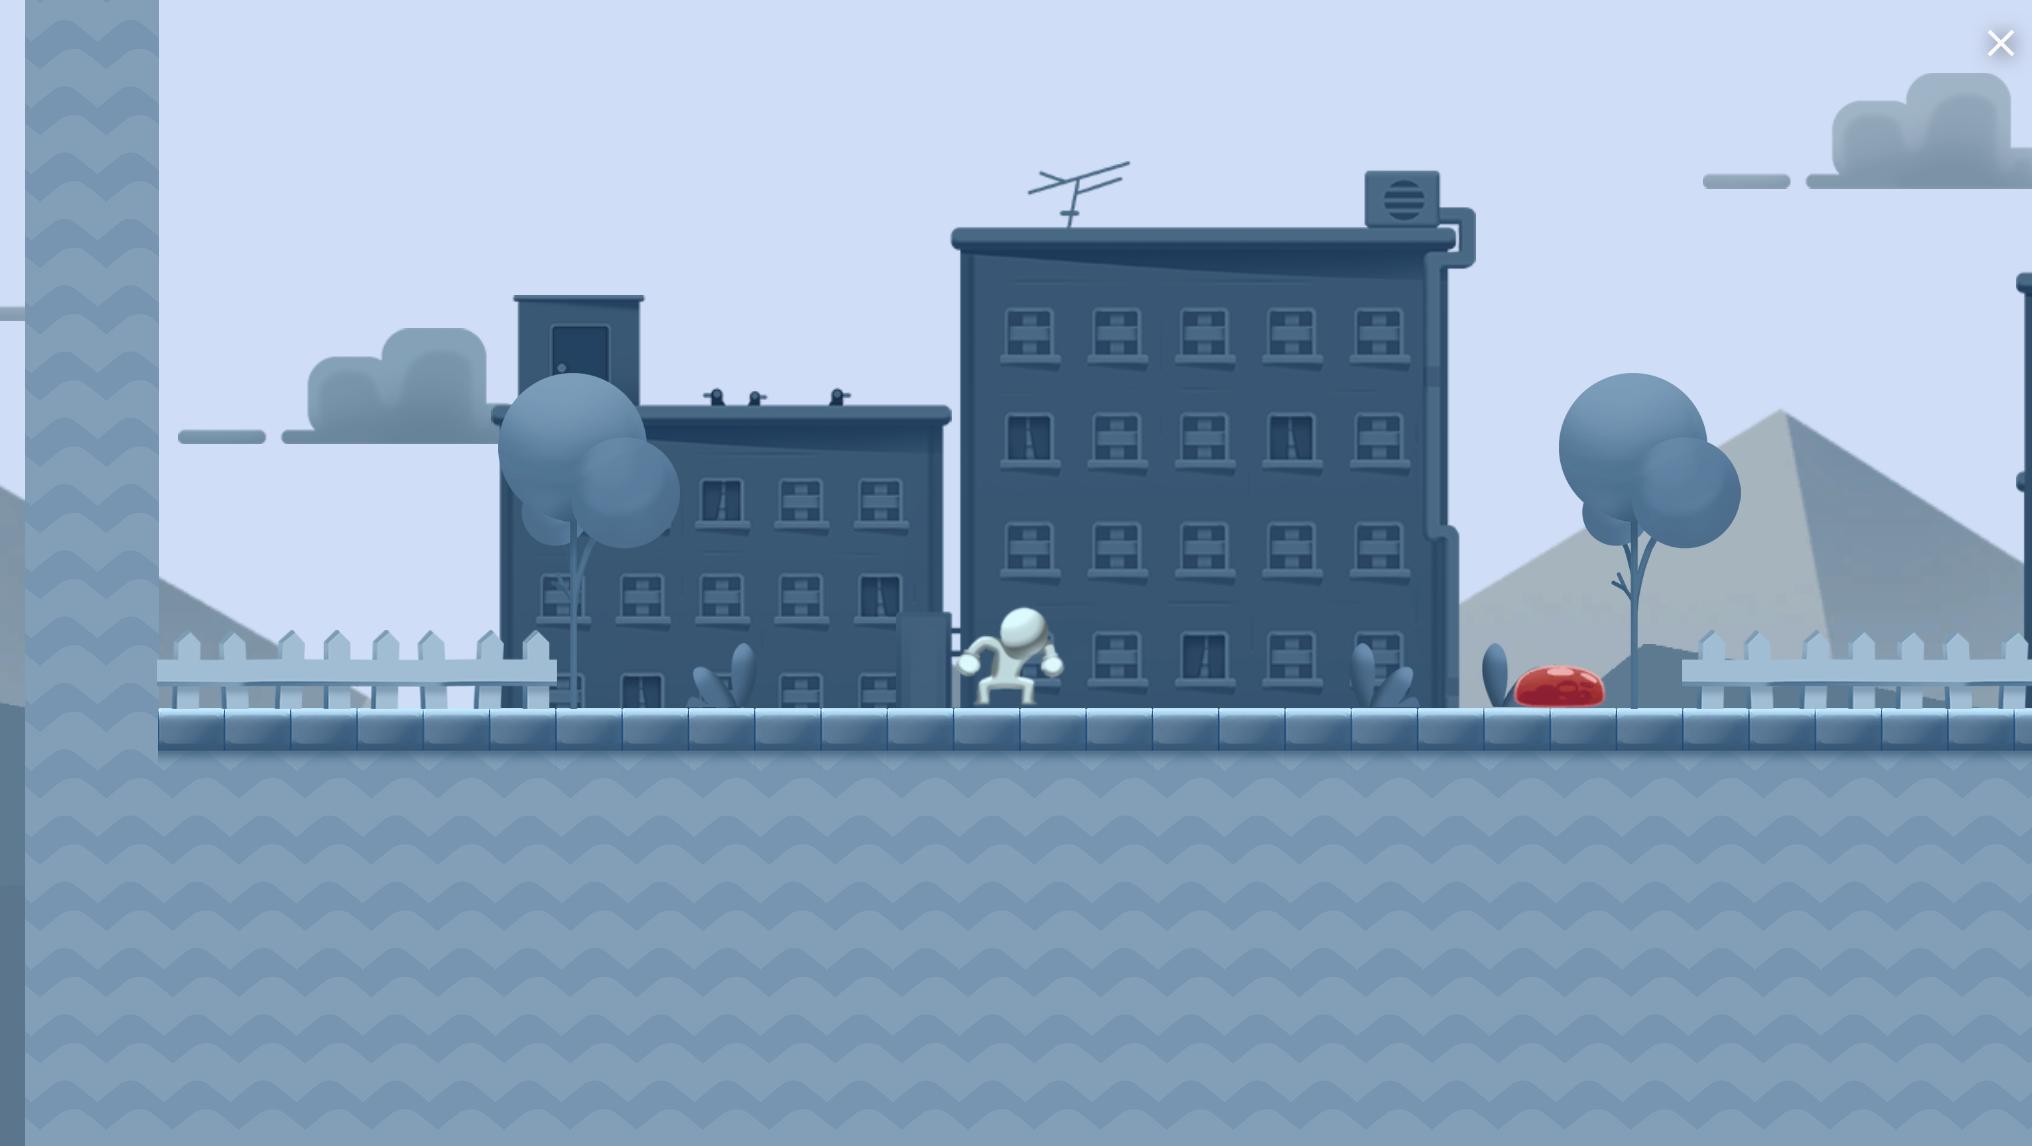 Platformer Microgame